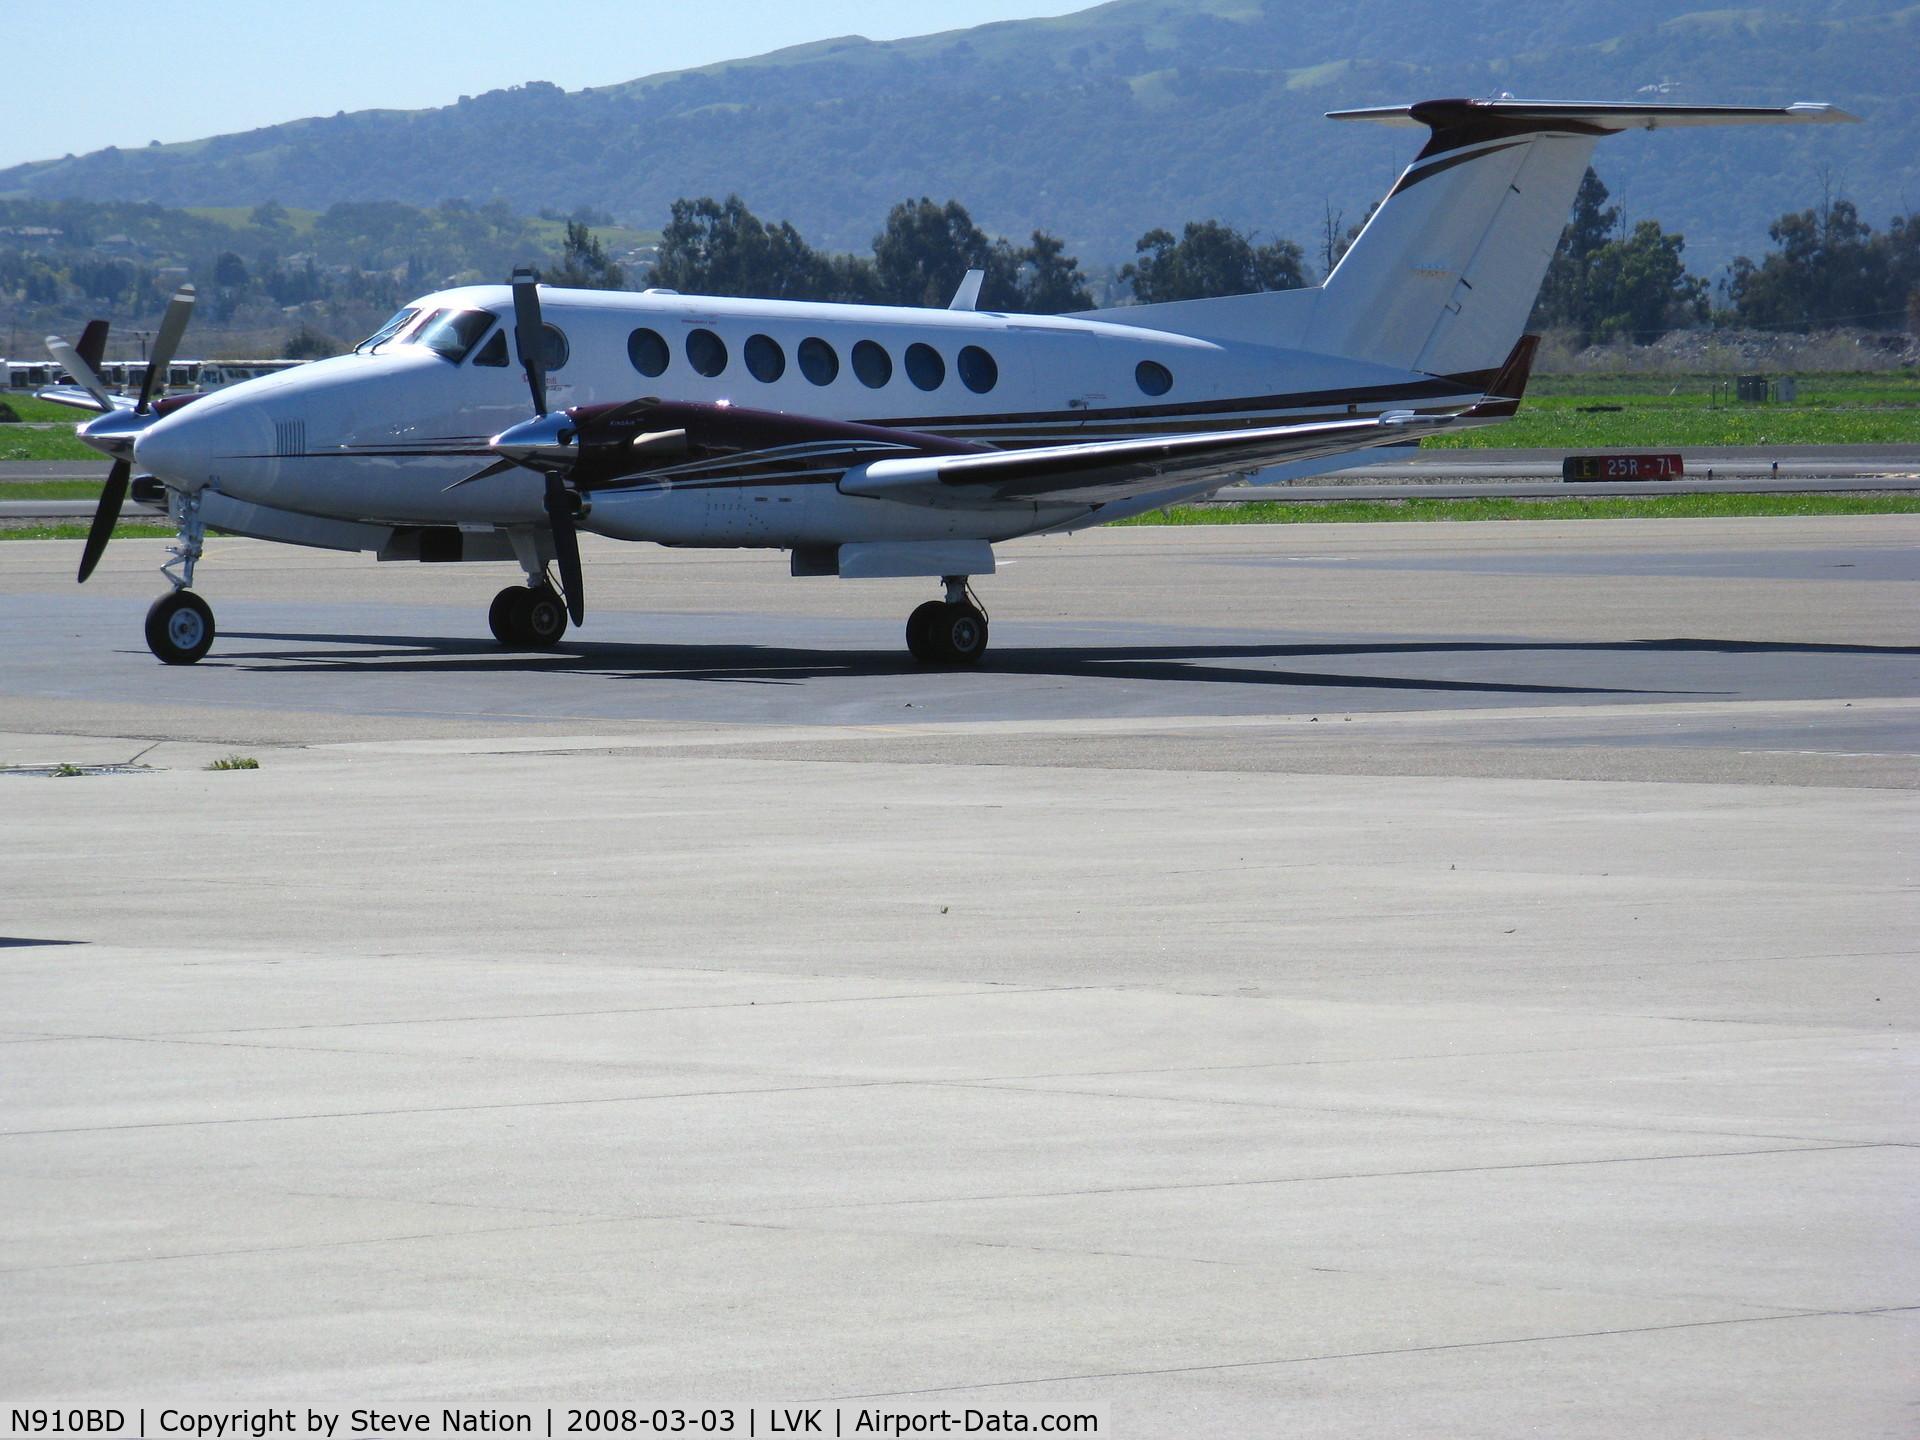 N910BD, Raytheon Aircraft Company B300 C/N FL-483, West Sacramento, CA-based DBS Air Raytheon B300 King Air @Livermore, CA